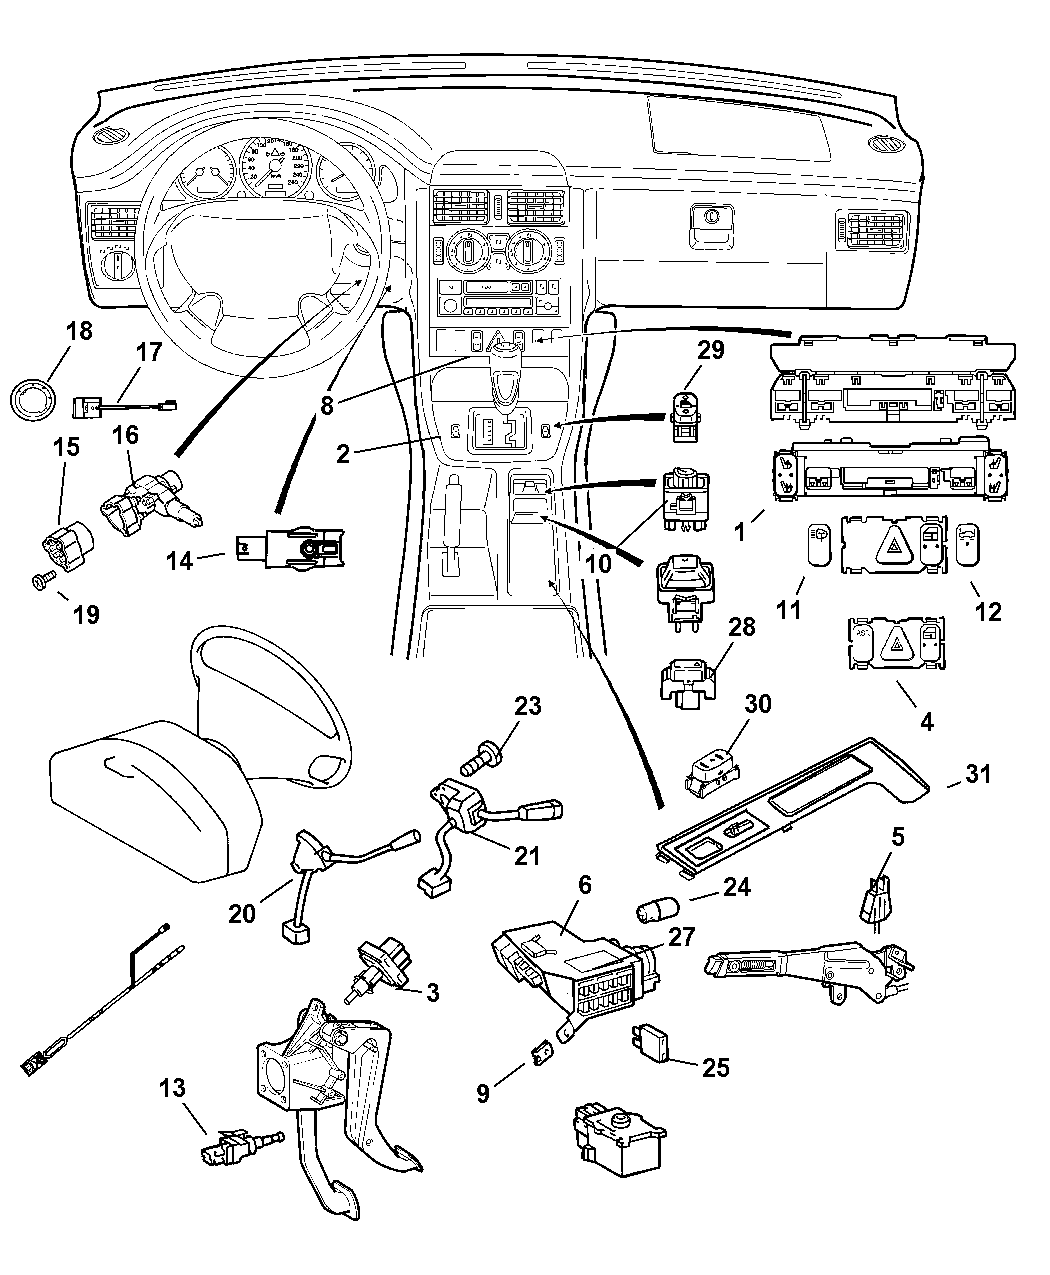 68001655AA - Genuine Mopar HOUSING-IGNITION SWITCH